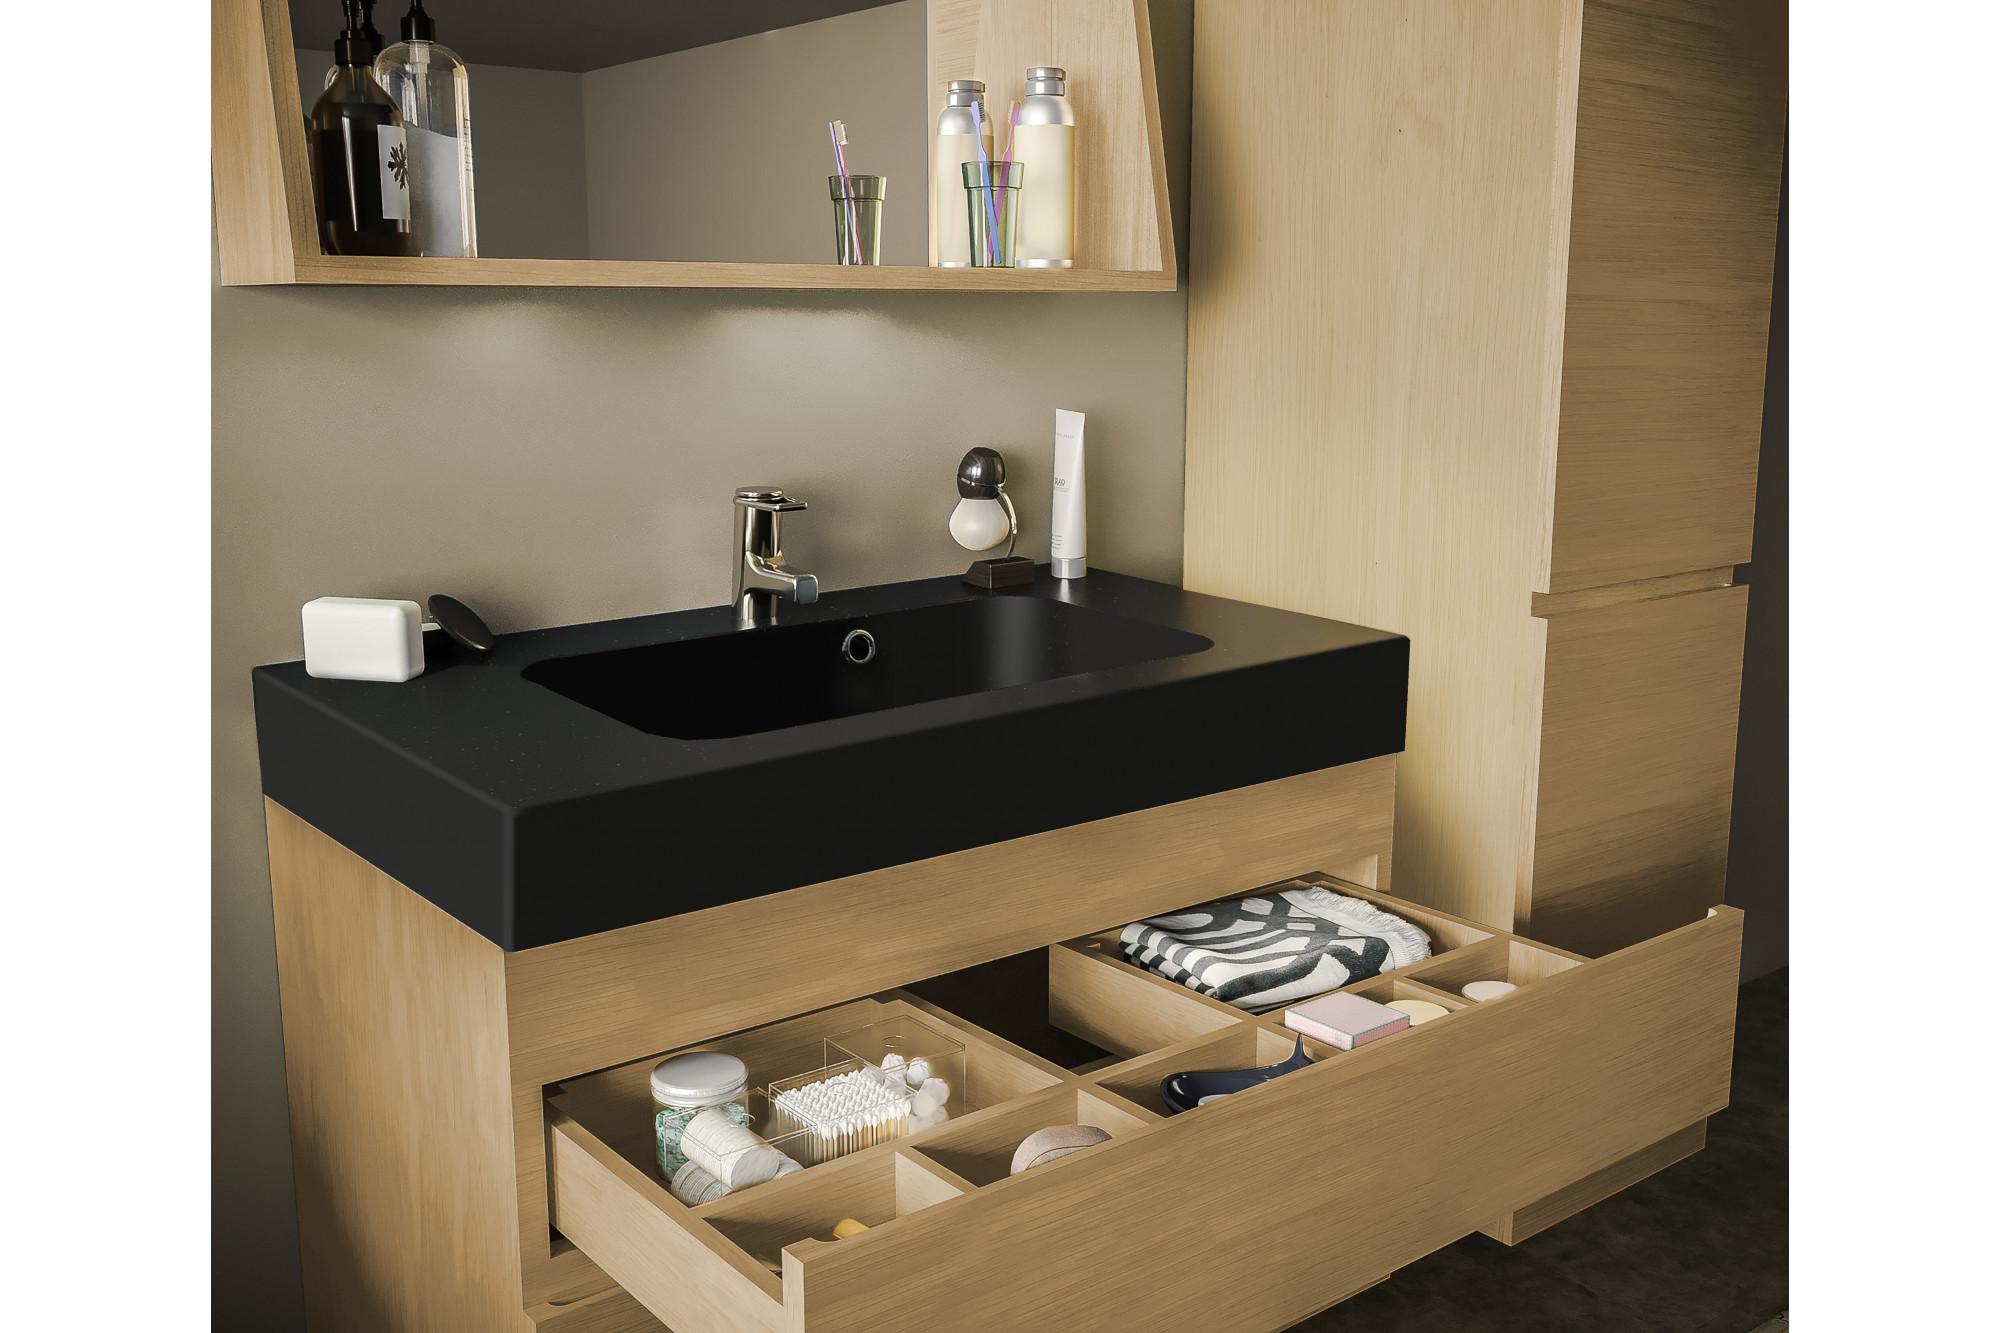 Salle De Bain Avec Bois meuble de salle de bain en bois massif avec sa vasque noir mat - hellin